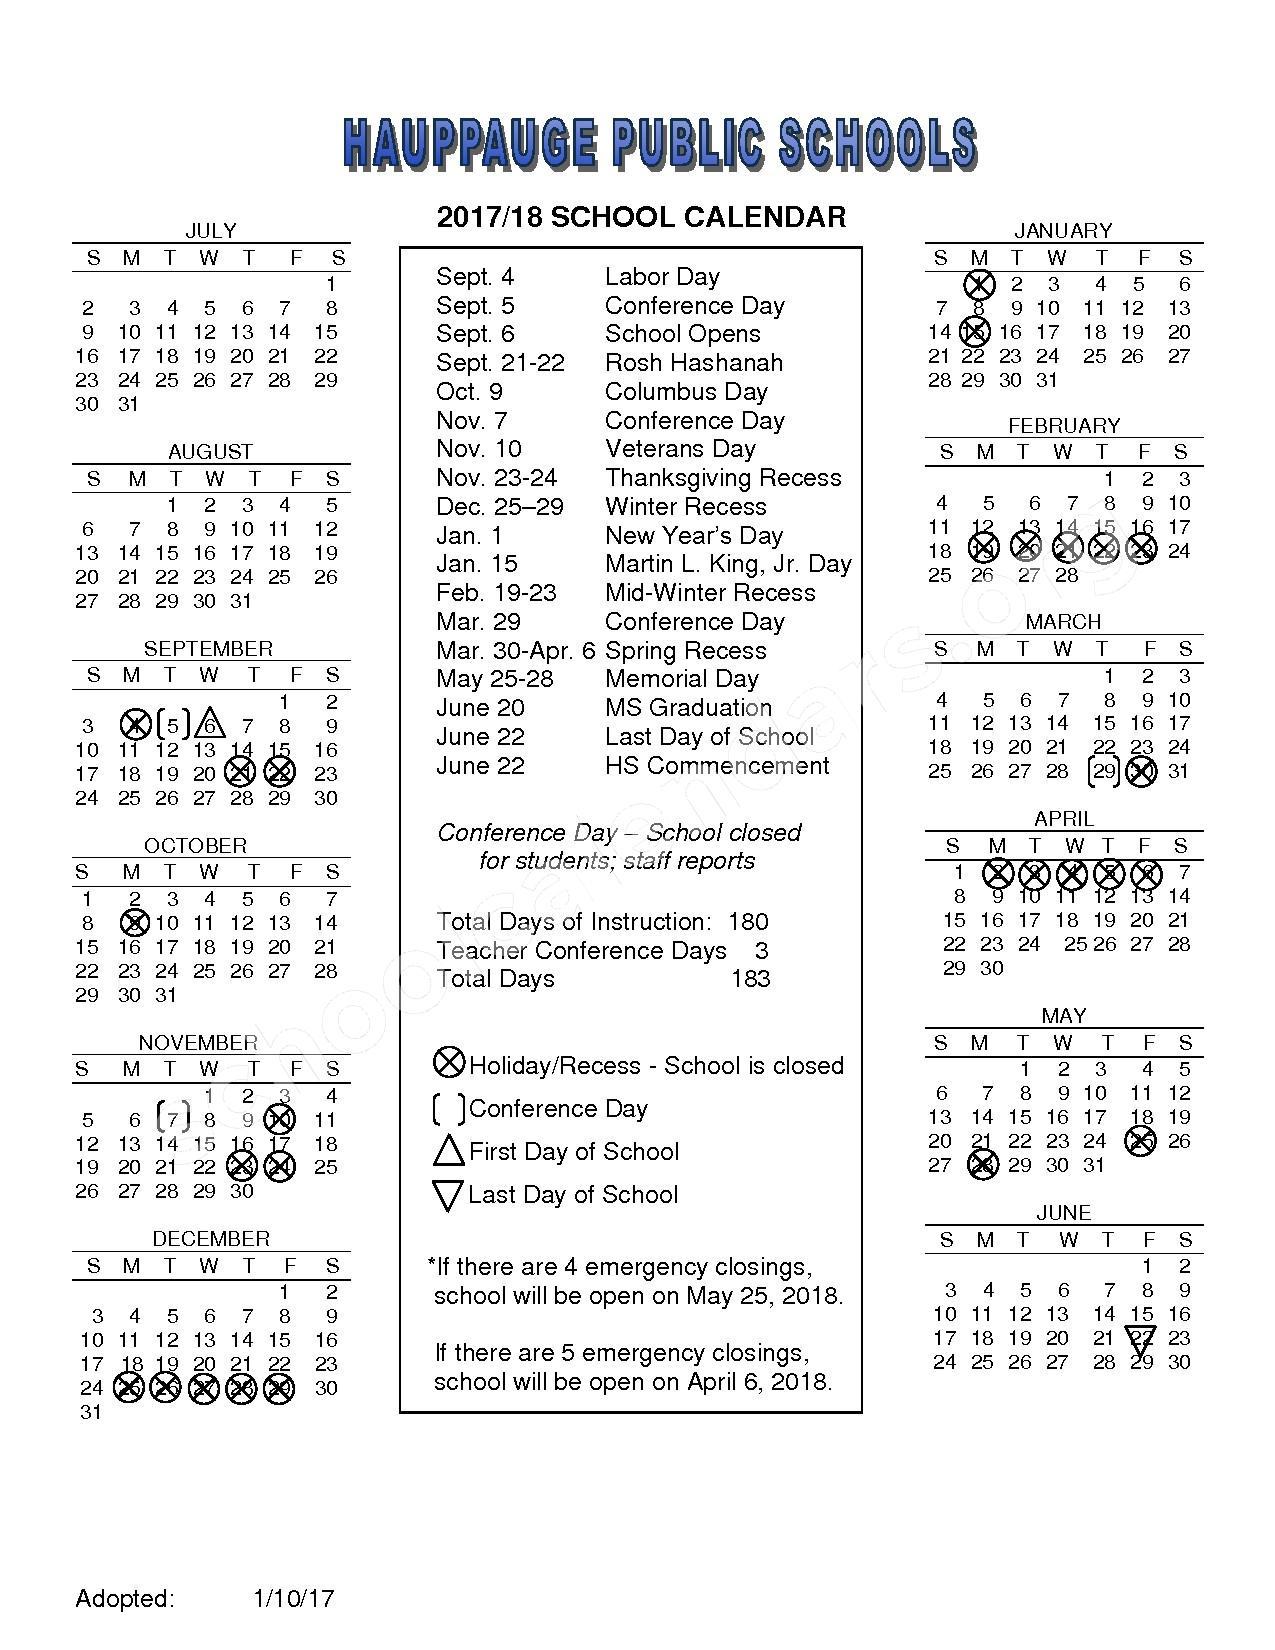 2017 - 2018 School Calendar – Hauppauge Union Free School District – page 1